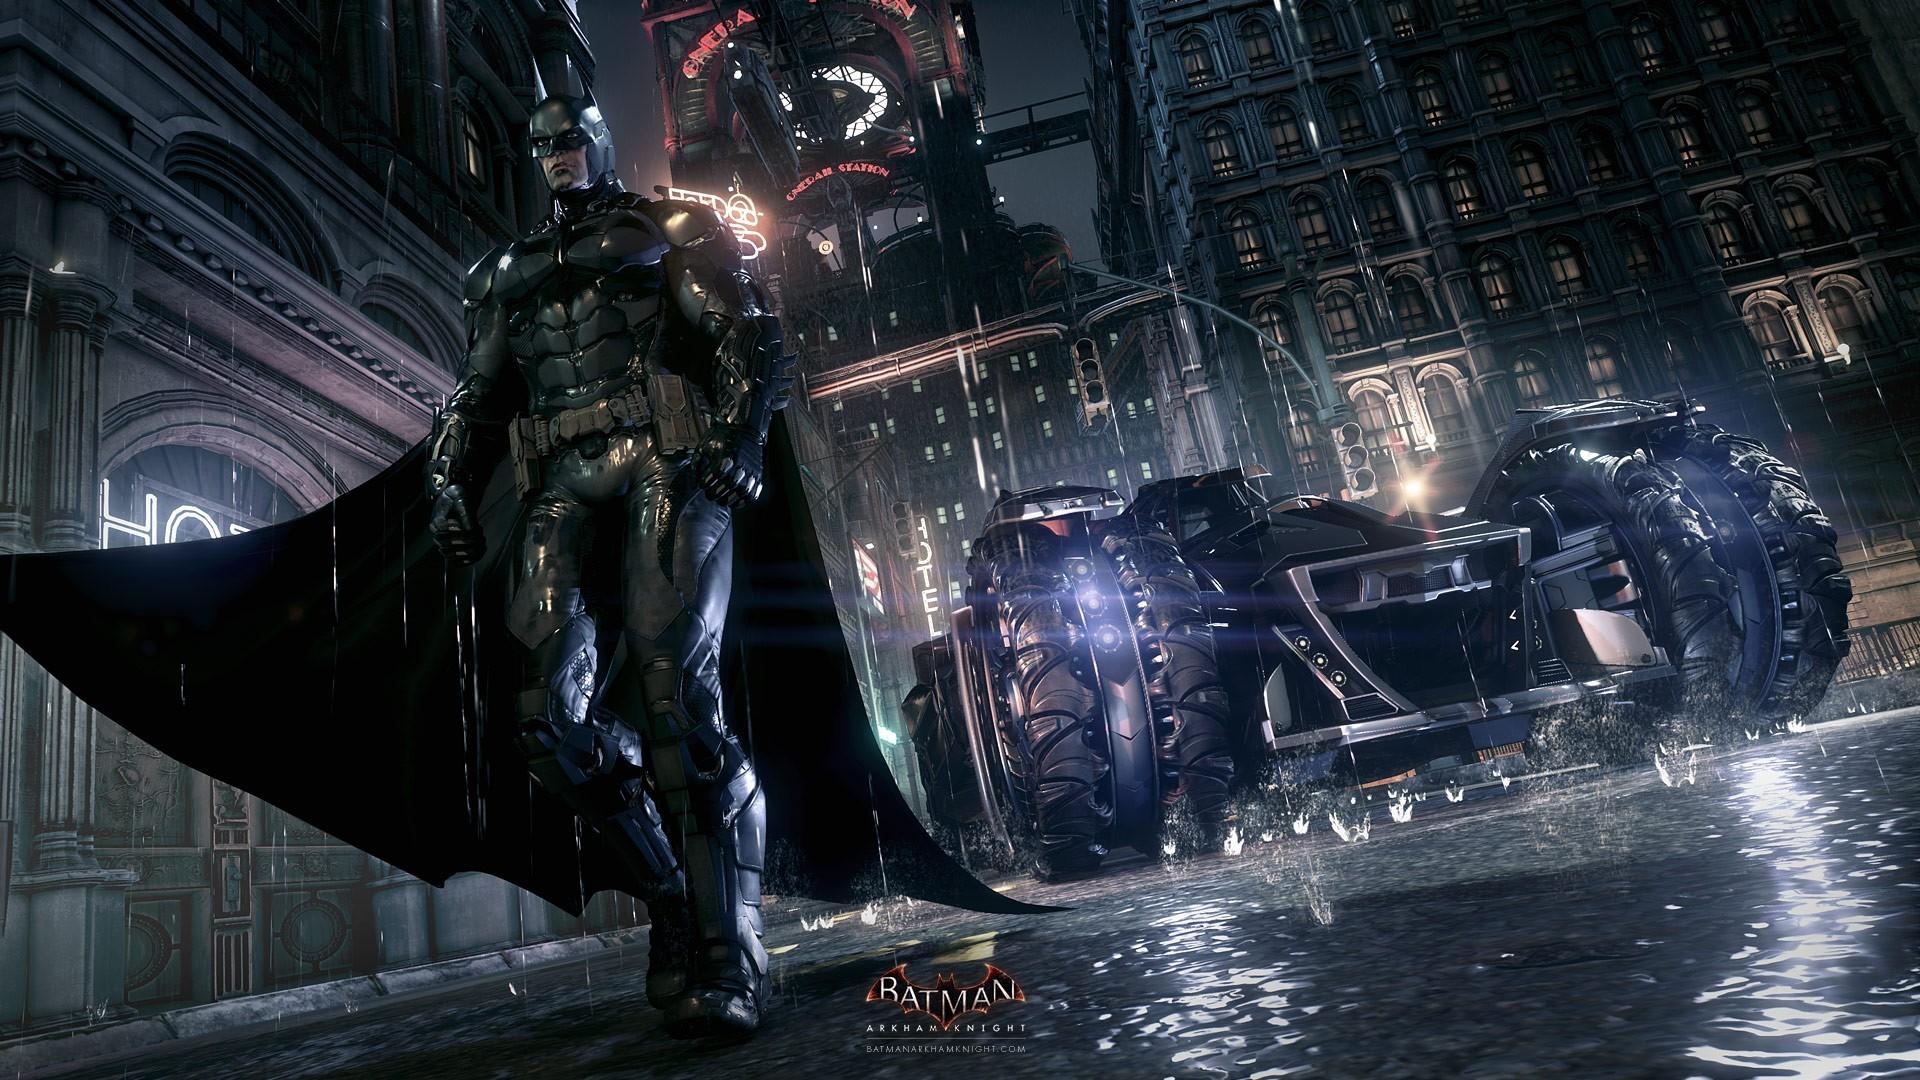 2880x1800 Injustice 2 Batman